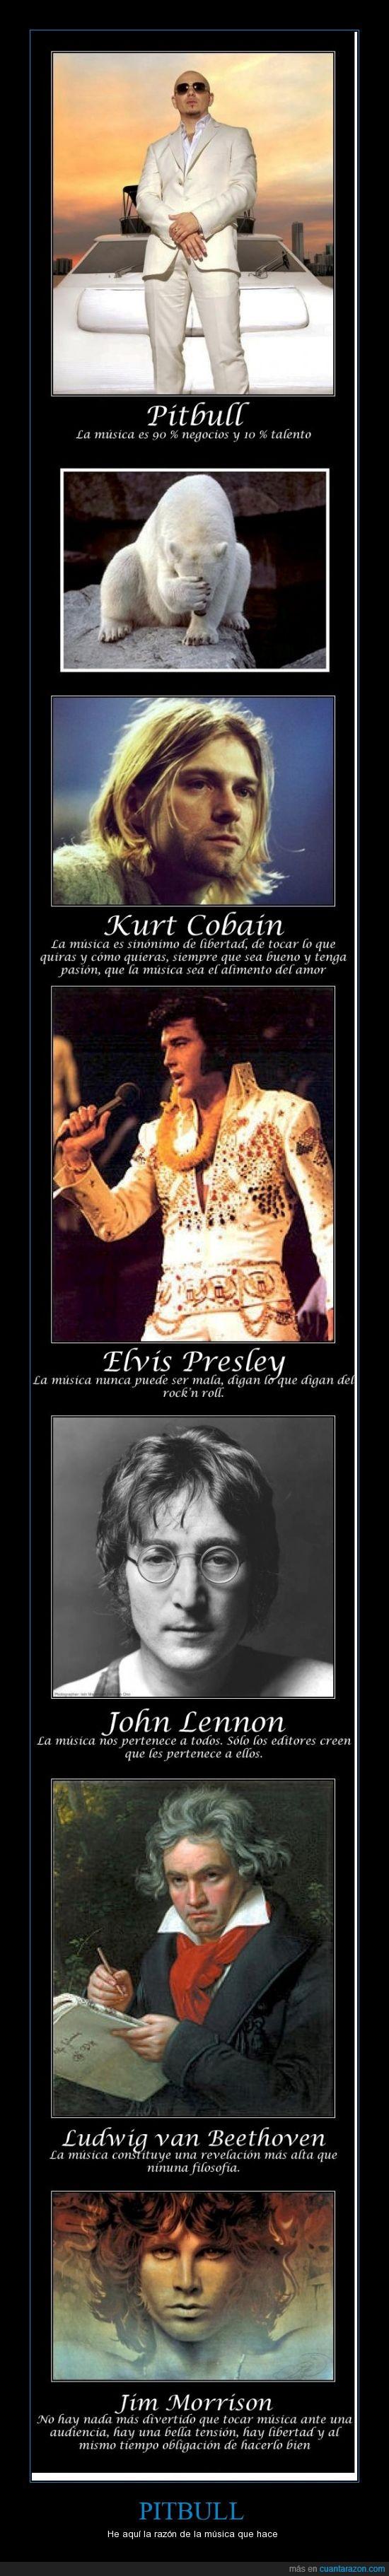 Beethoven,dinero,Elvis Presley,facepalm,fail,Jim Morrison,John Lennon,Kurt Cobain,negocios,Pitbull